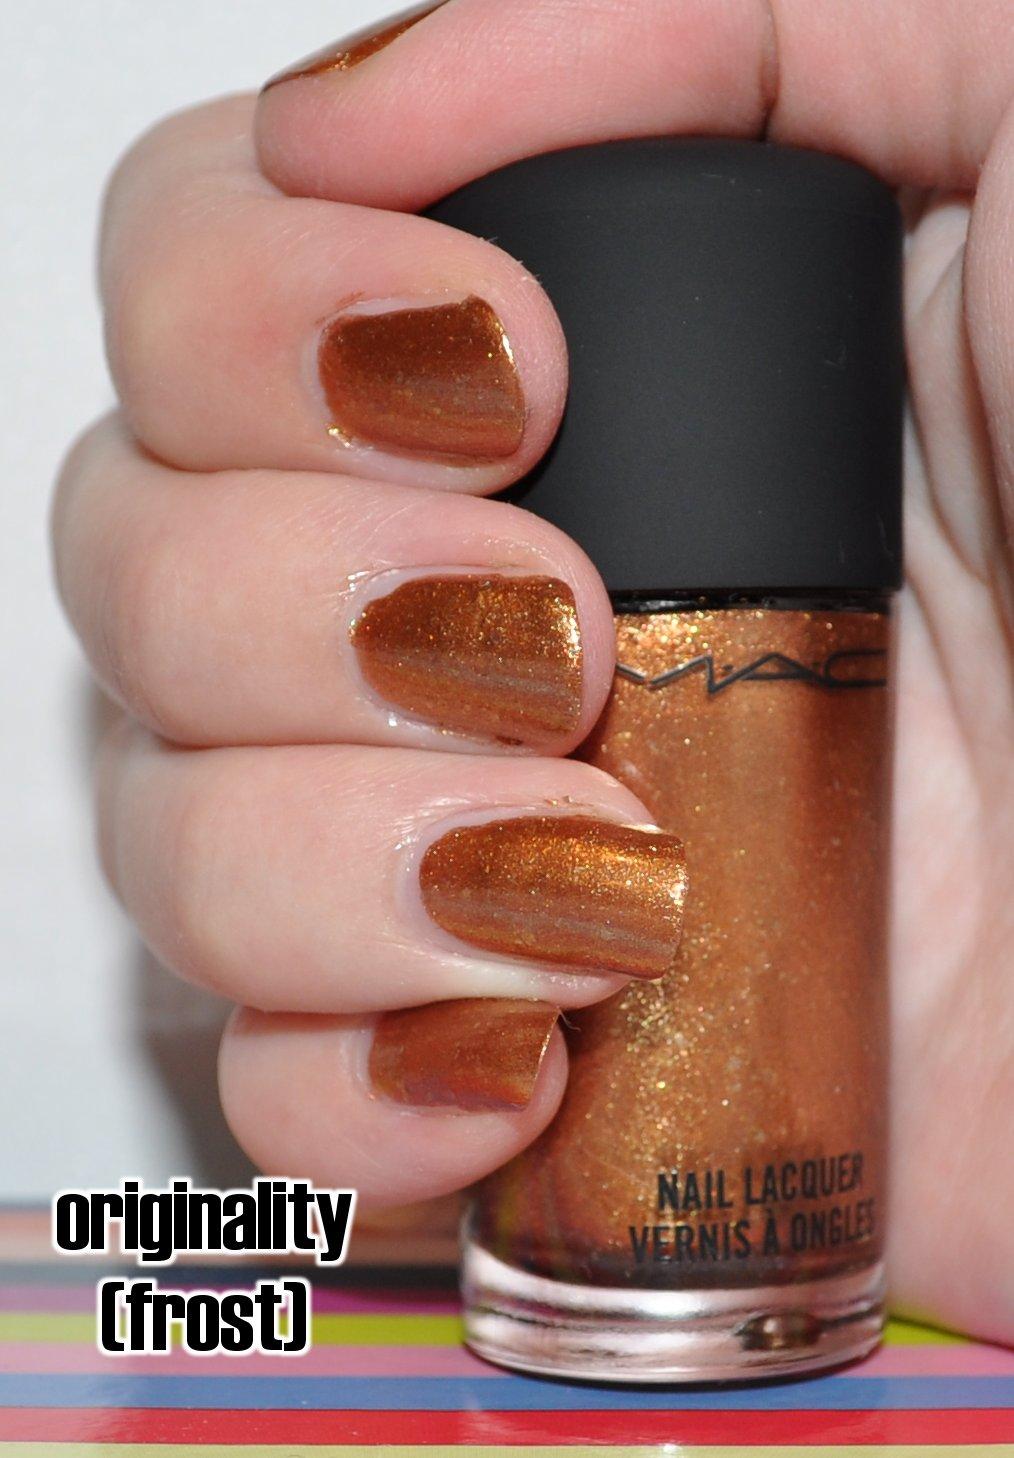 thatleanne: MAC Originality nail polish and small haul!